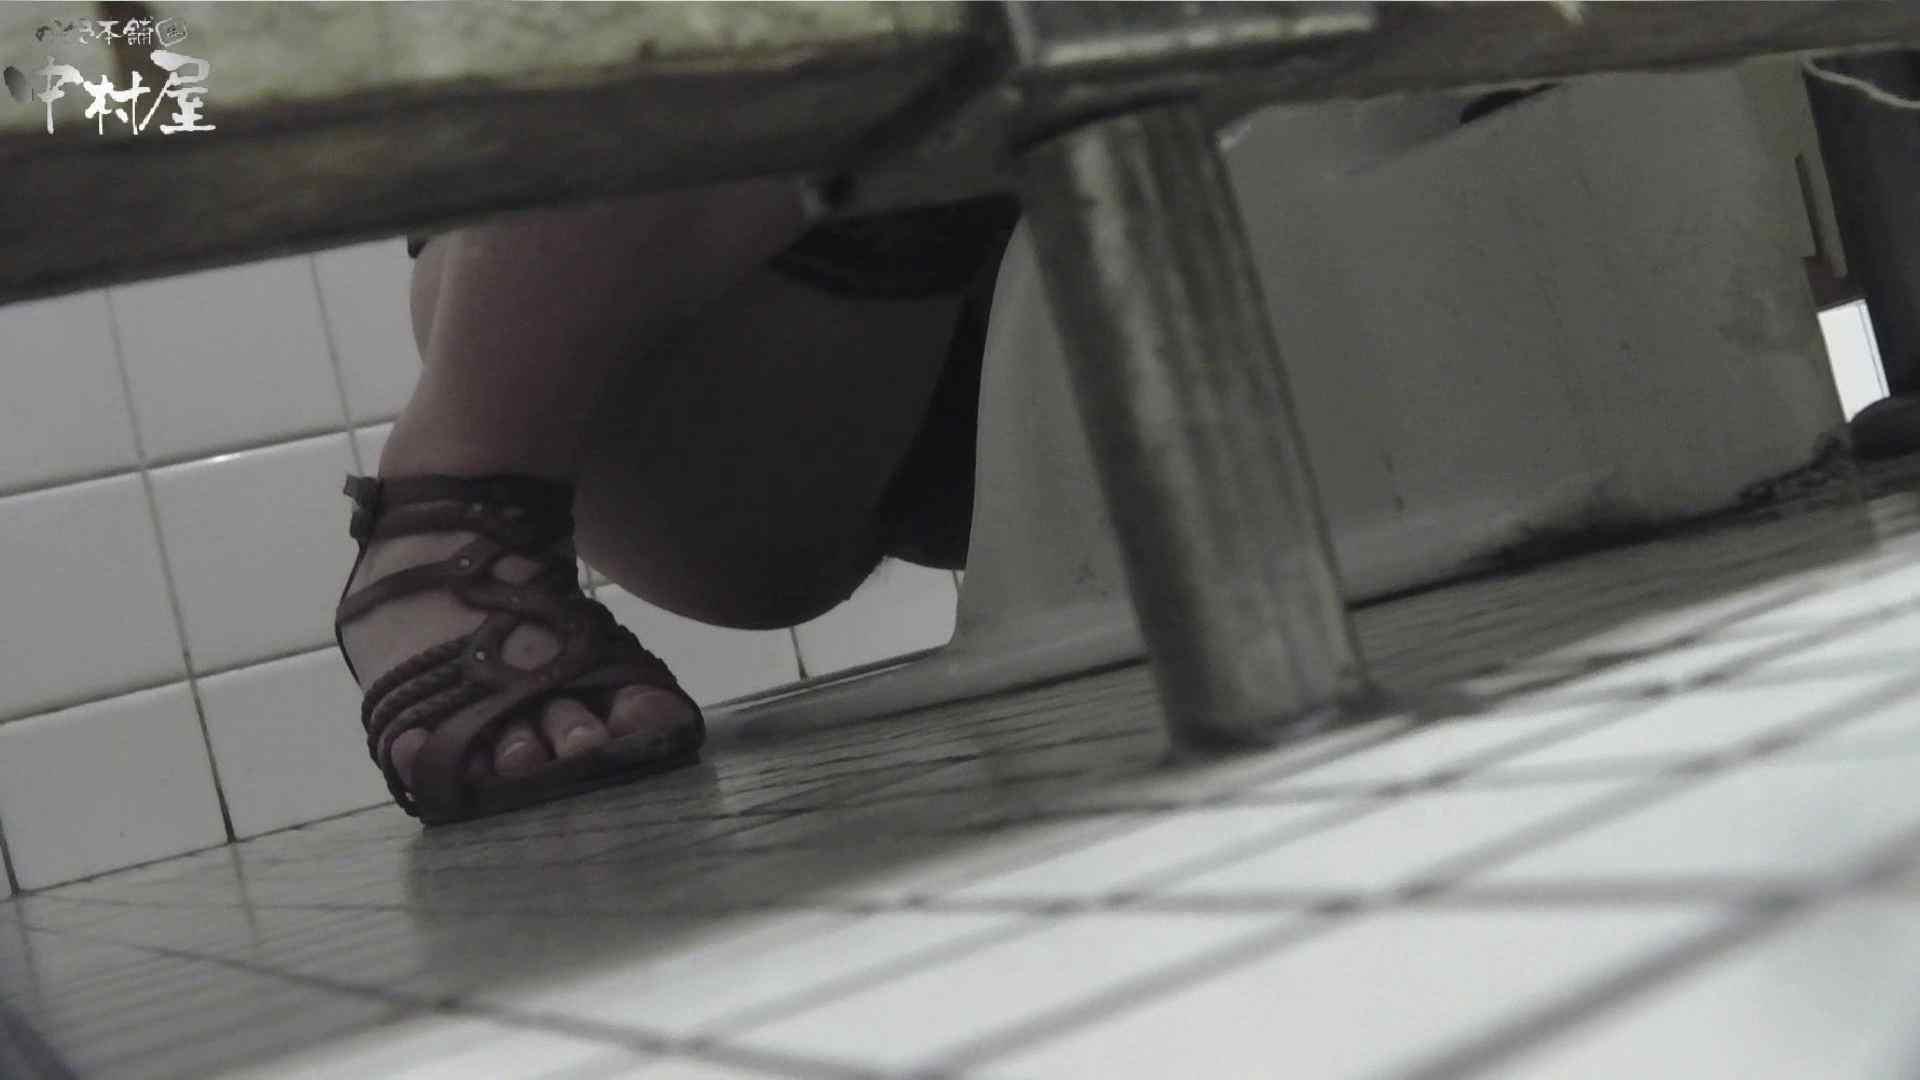 vol.42 命がけ潜伏洗面所! カカト上げながら・硬度強(太)・180g 洗面所編 のぞき動画キャプチャ 101PIX 59